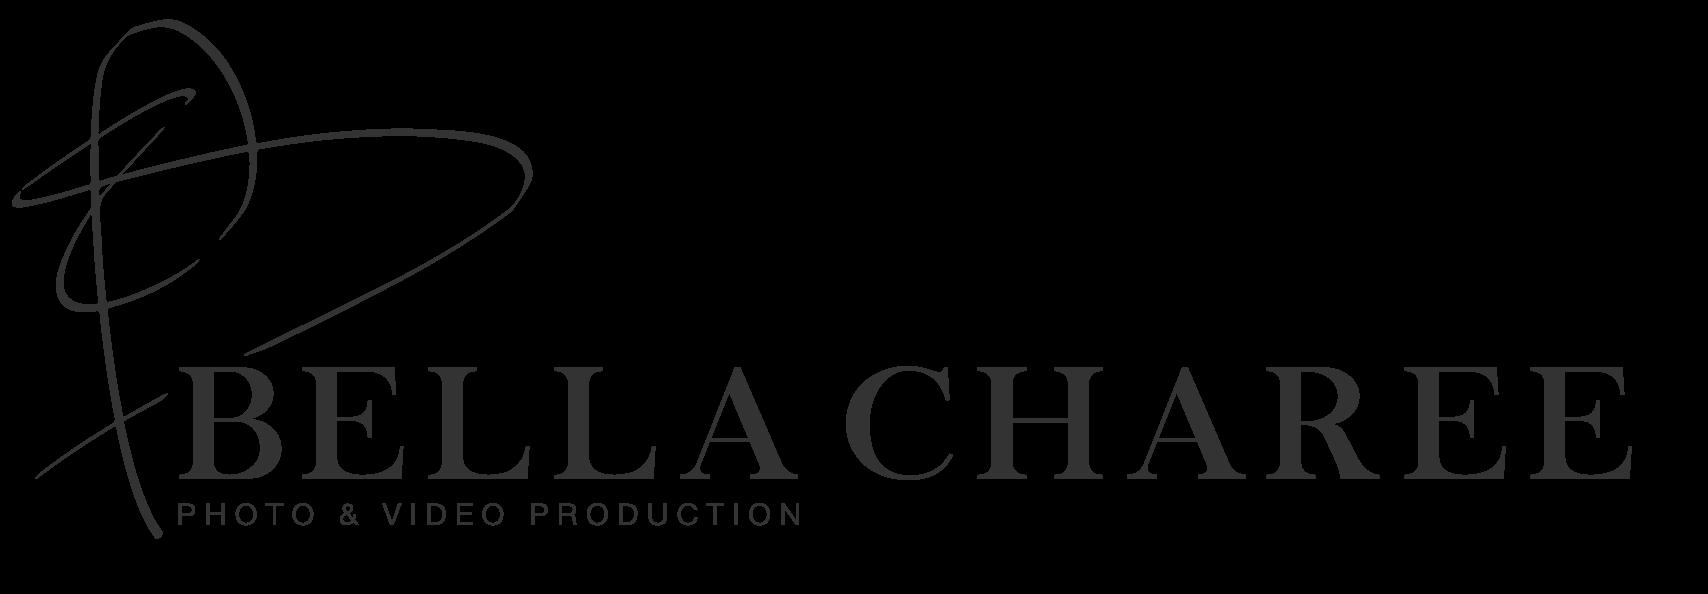 Bella Charee | Photo & Video Production Minneapolis, MN